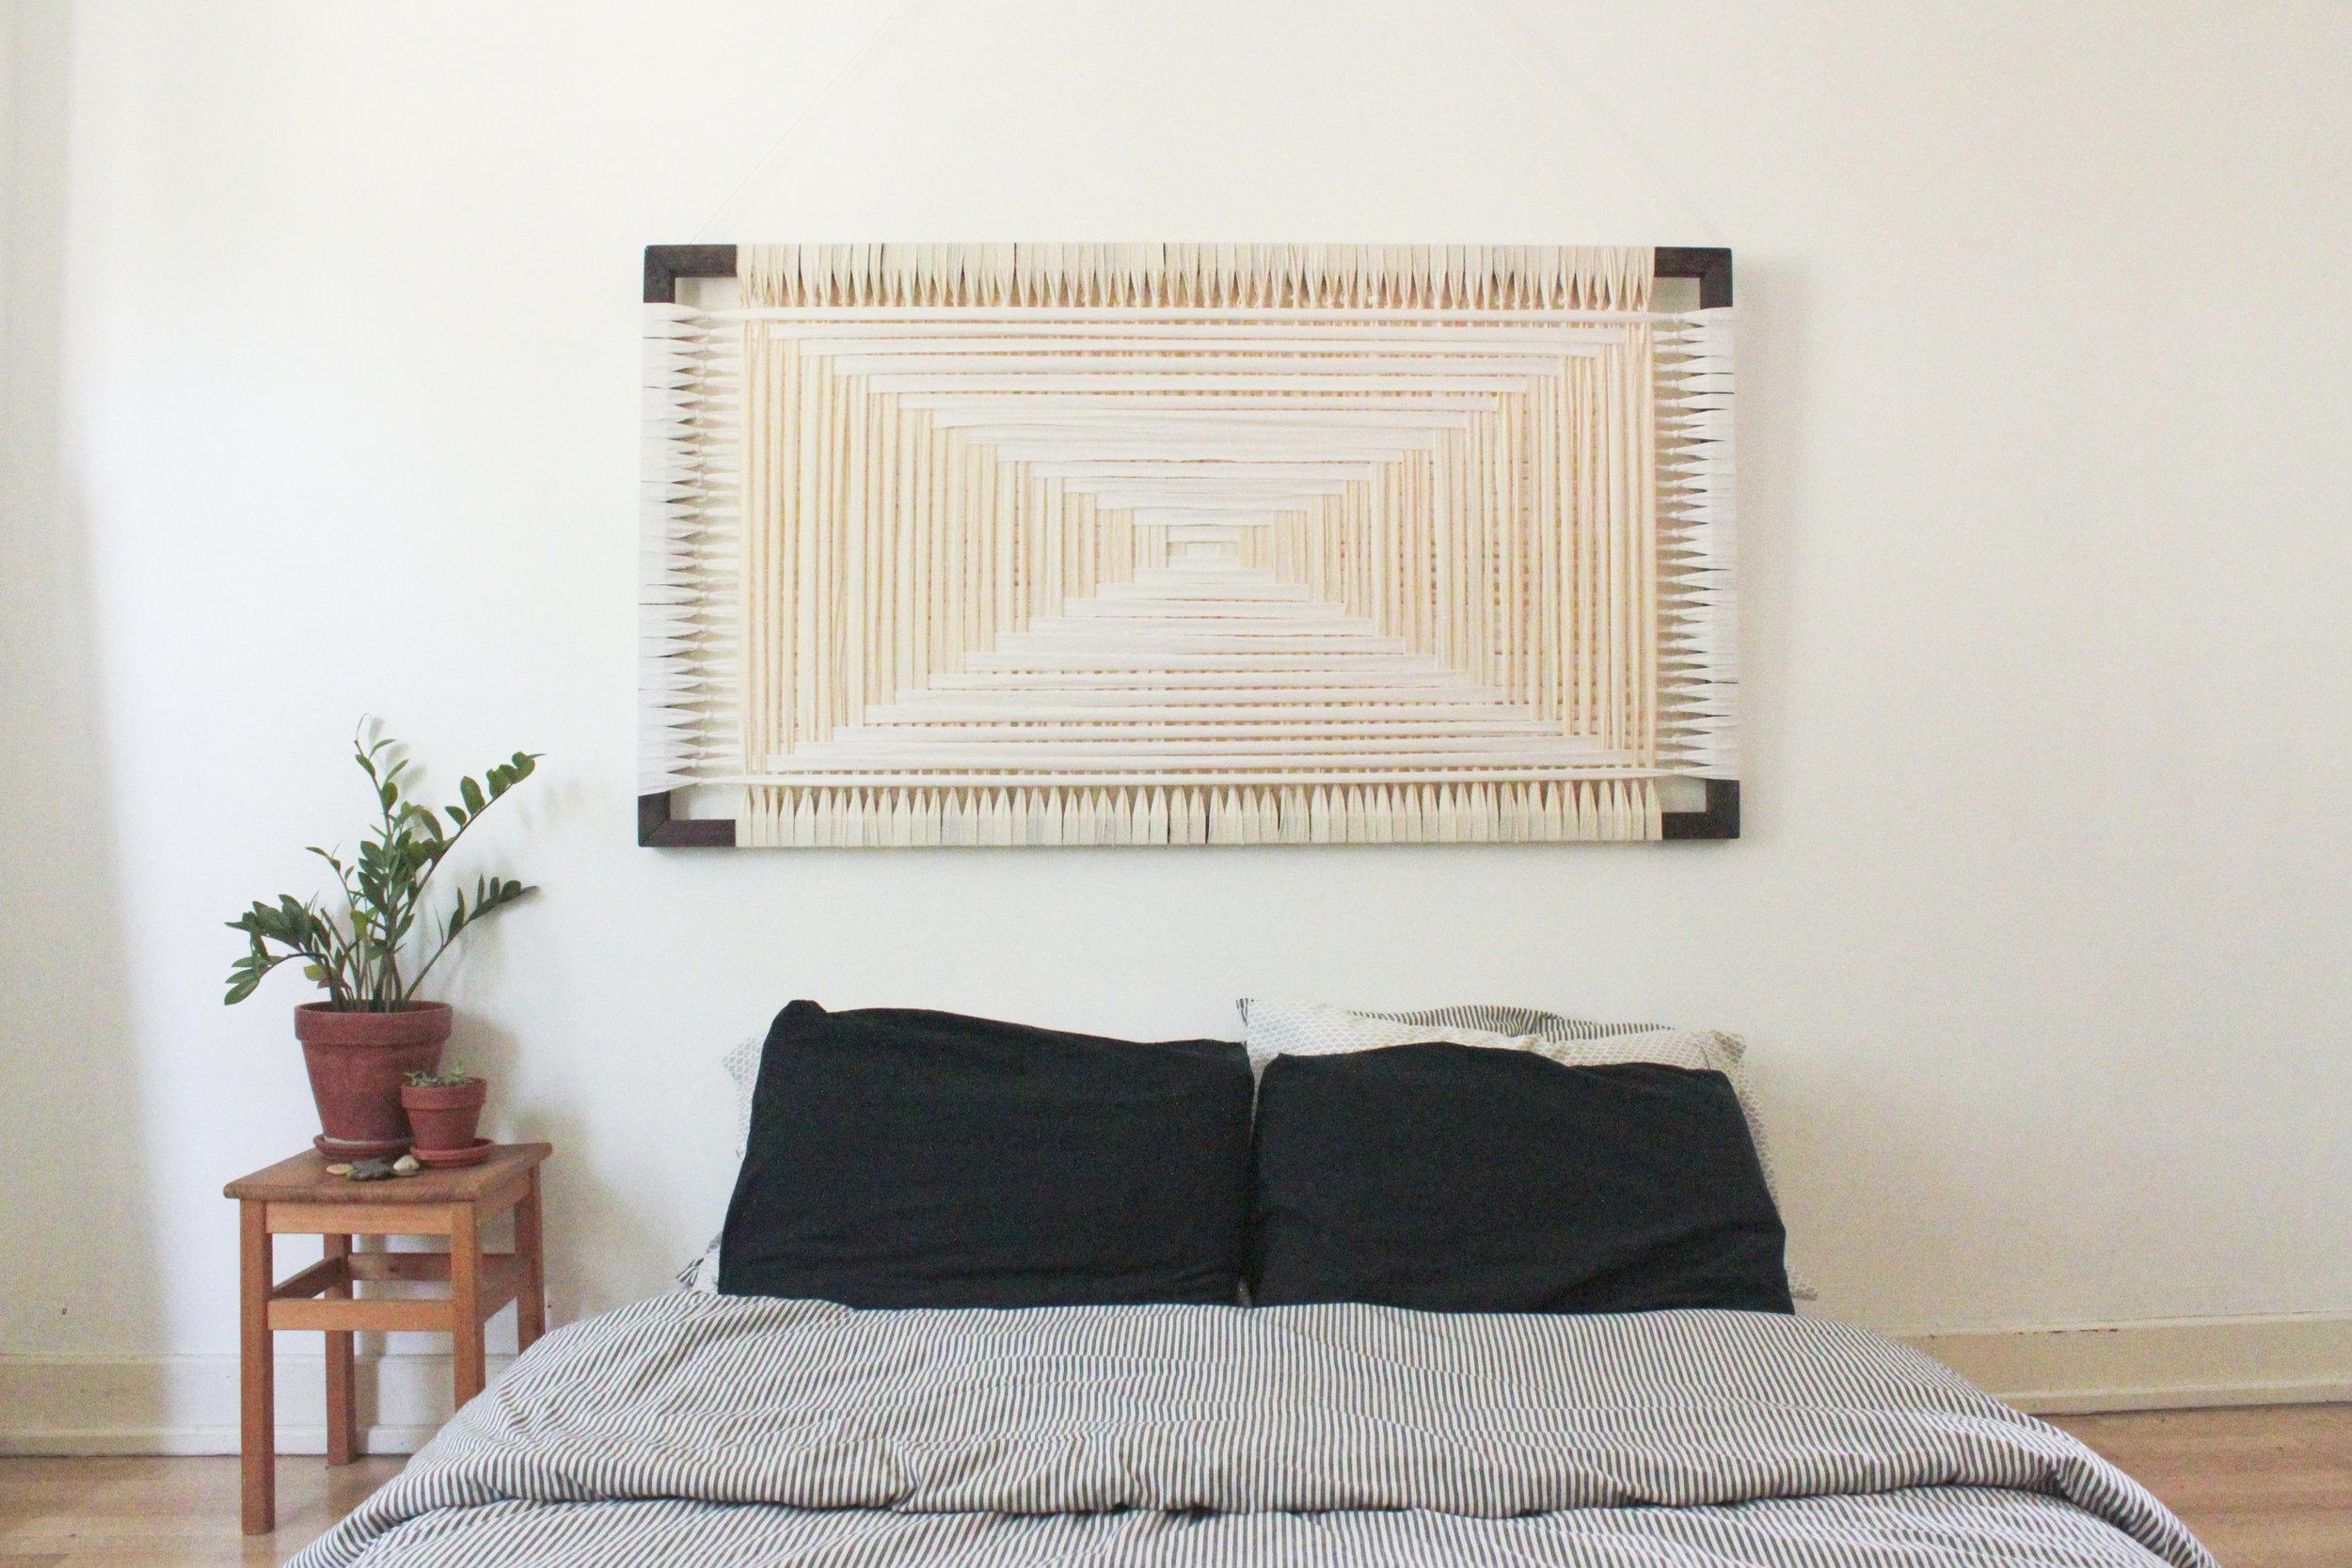 Large_Scale_Textile_Art.jpg